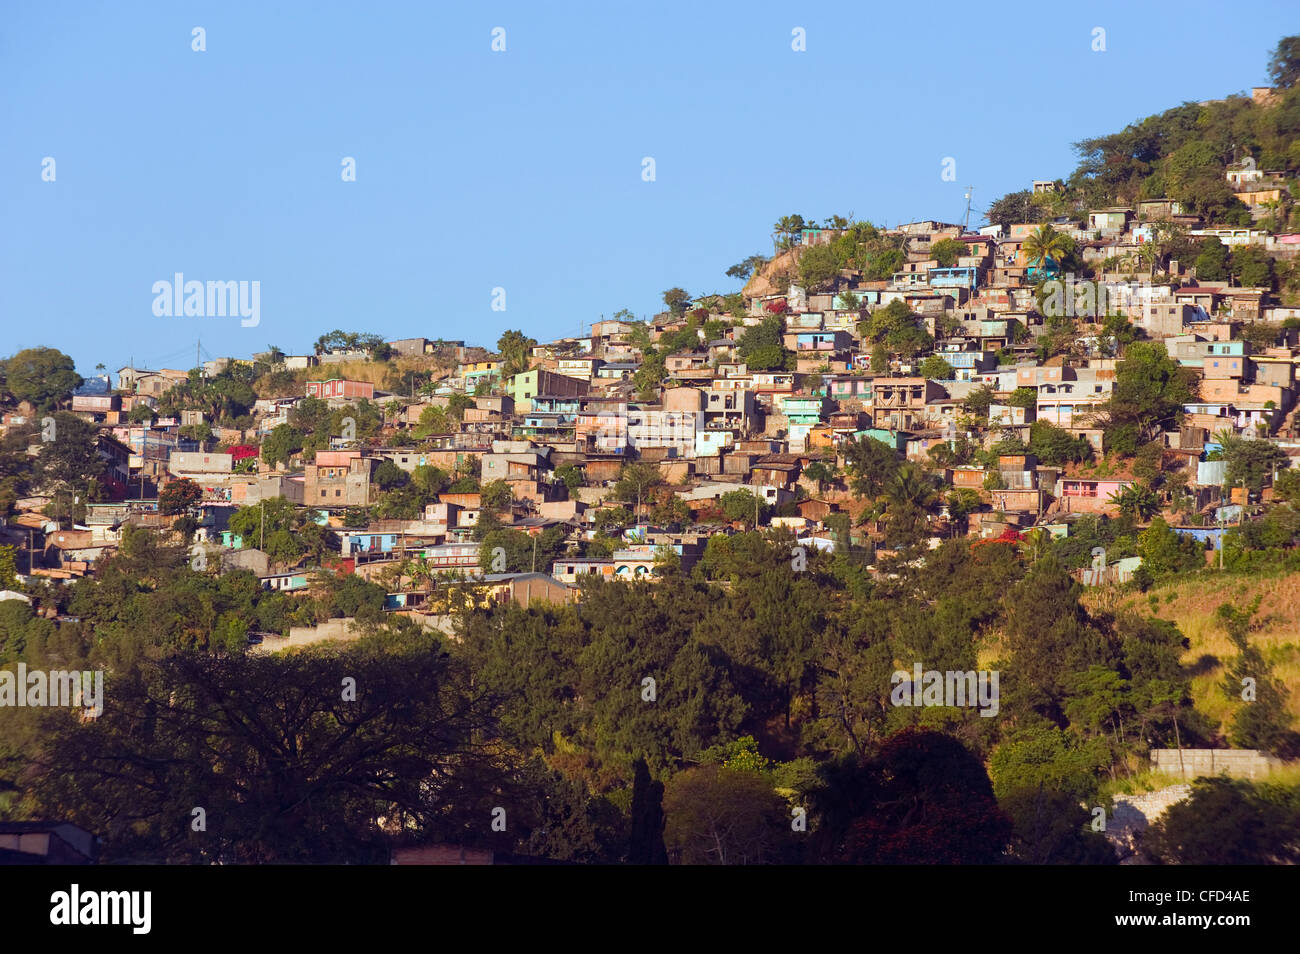 Hillside suburbs of Tegucigalpa, Honduras, Central America - Stock Image